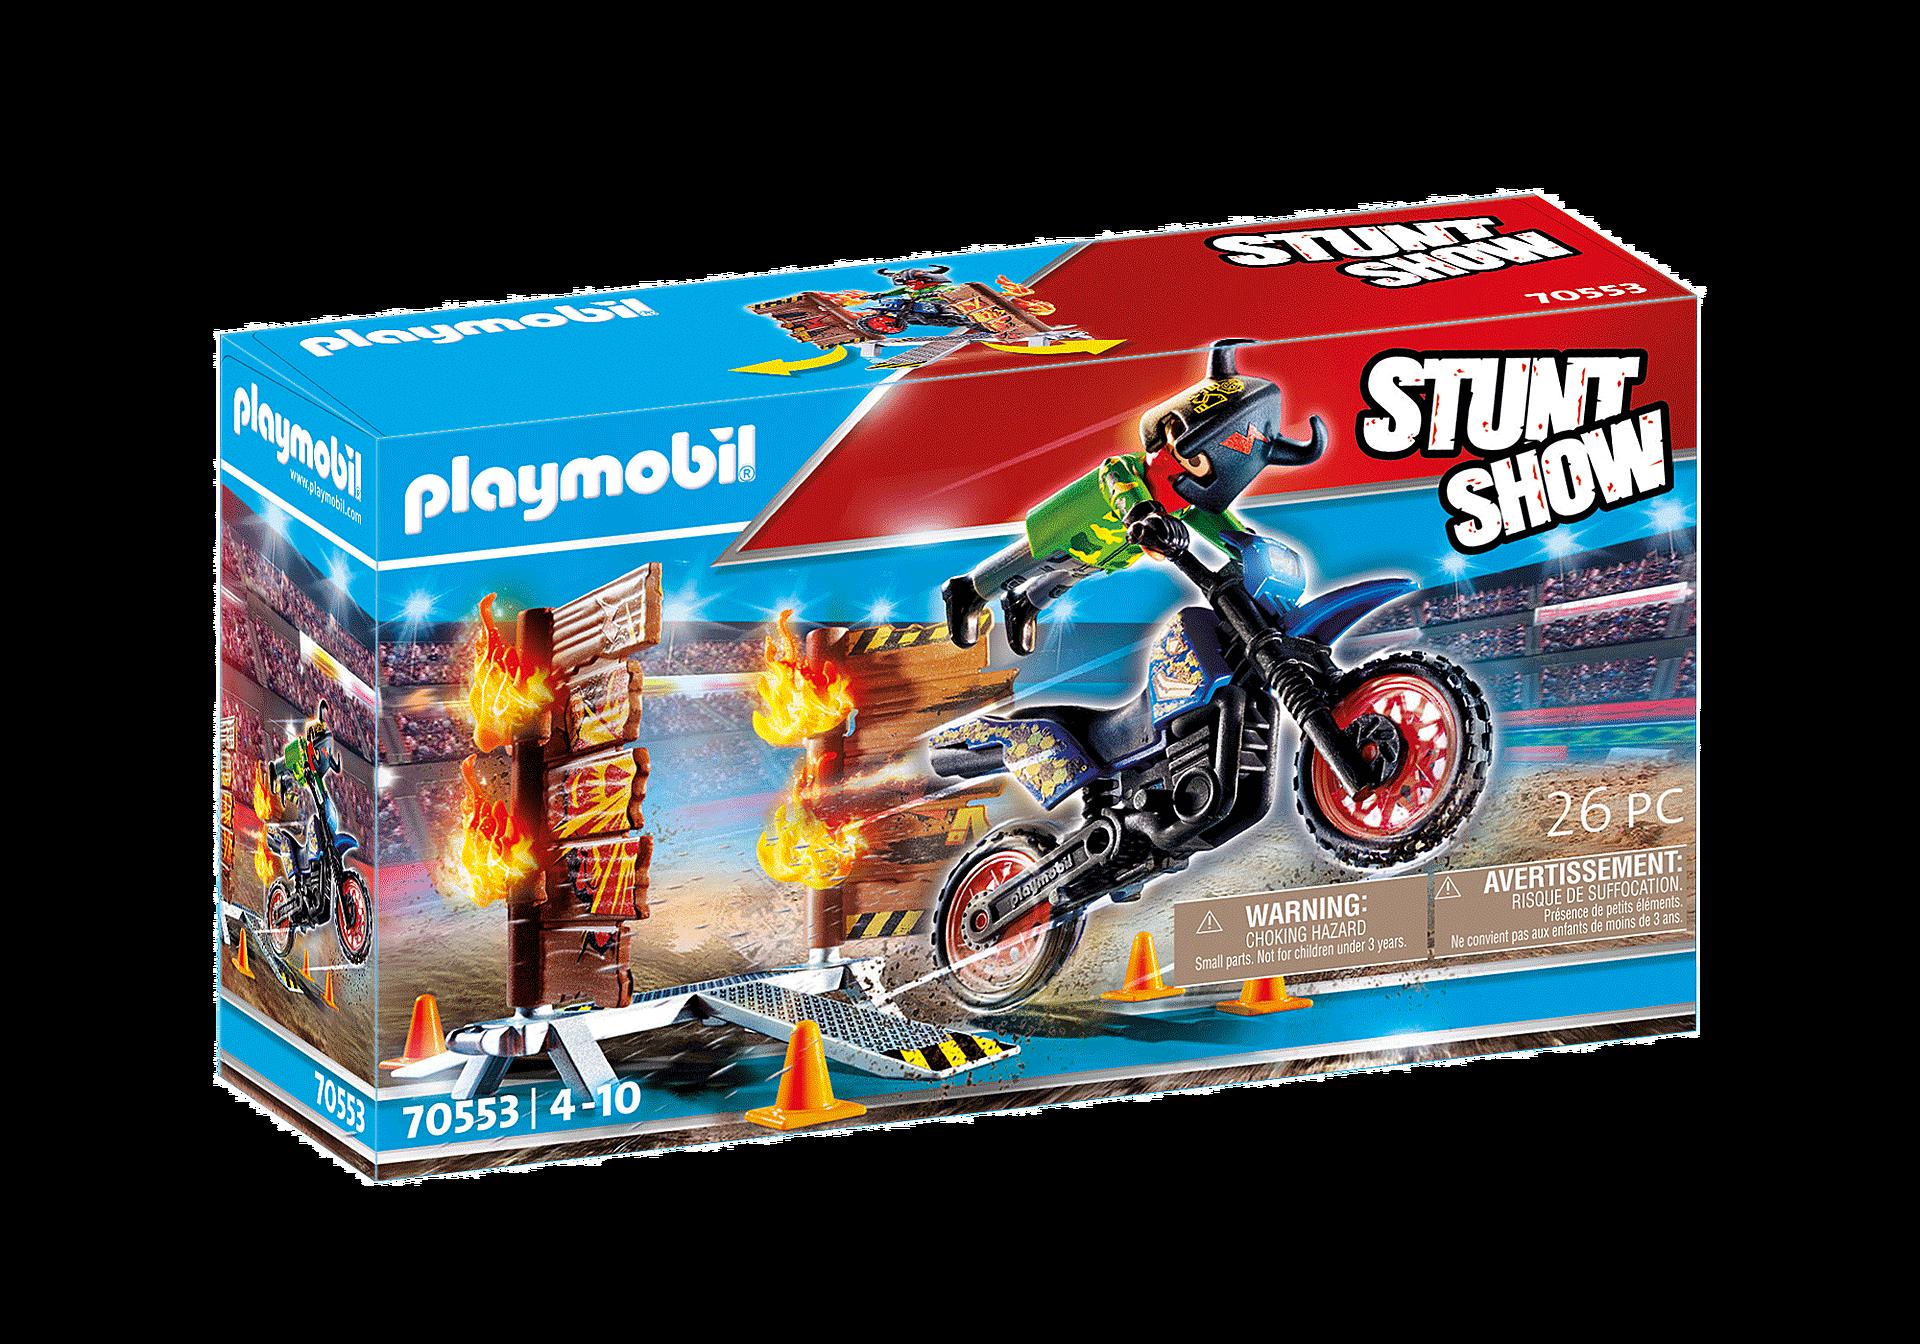 70553 Stuntshow Pilote de moto et mur de feu zoom image2